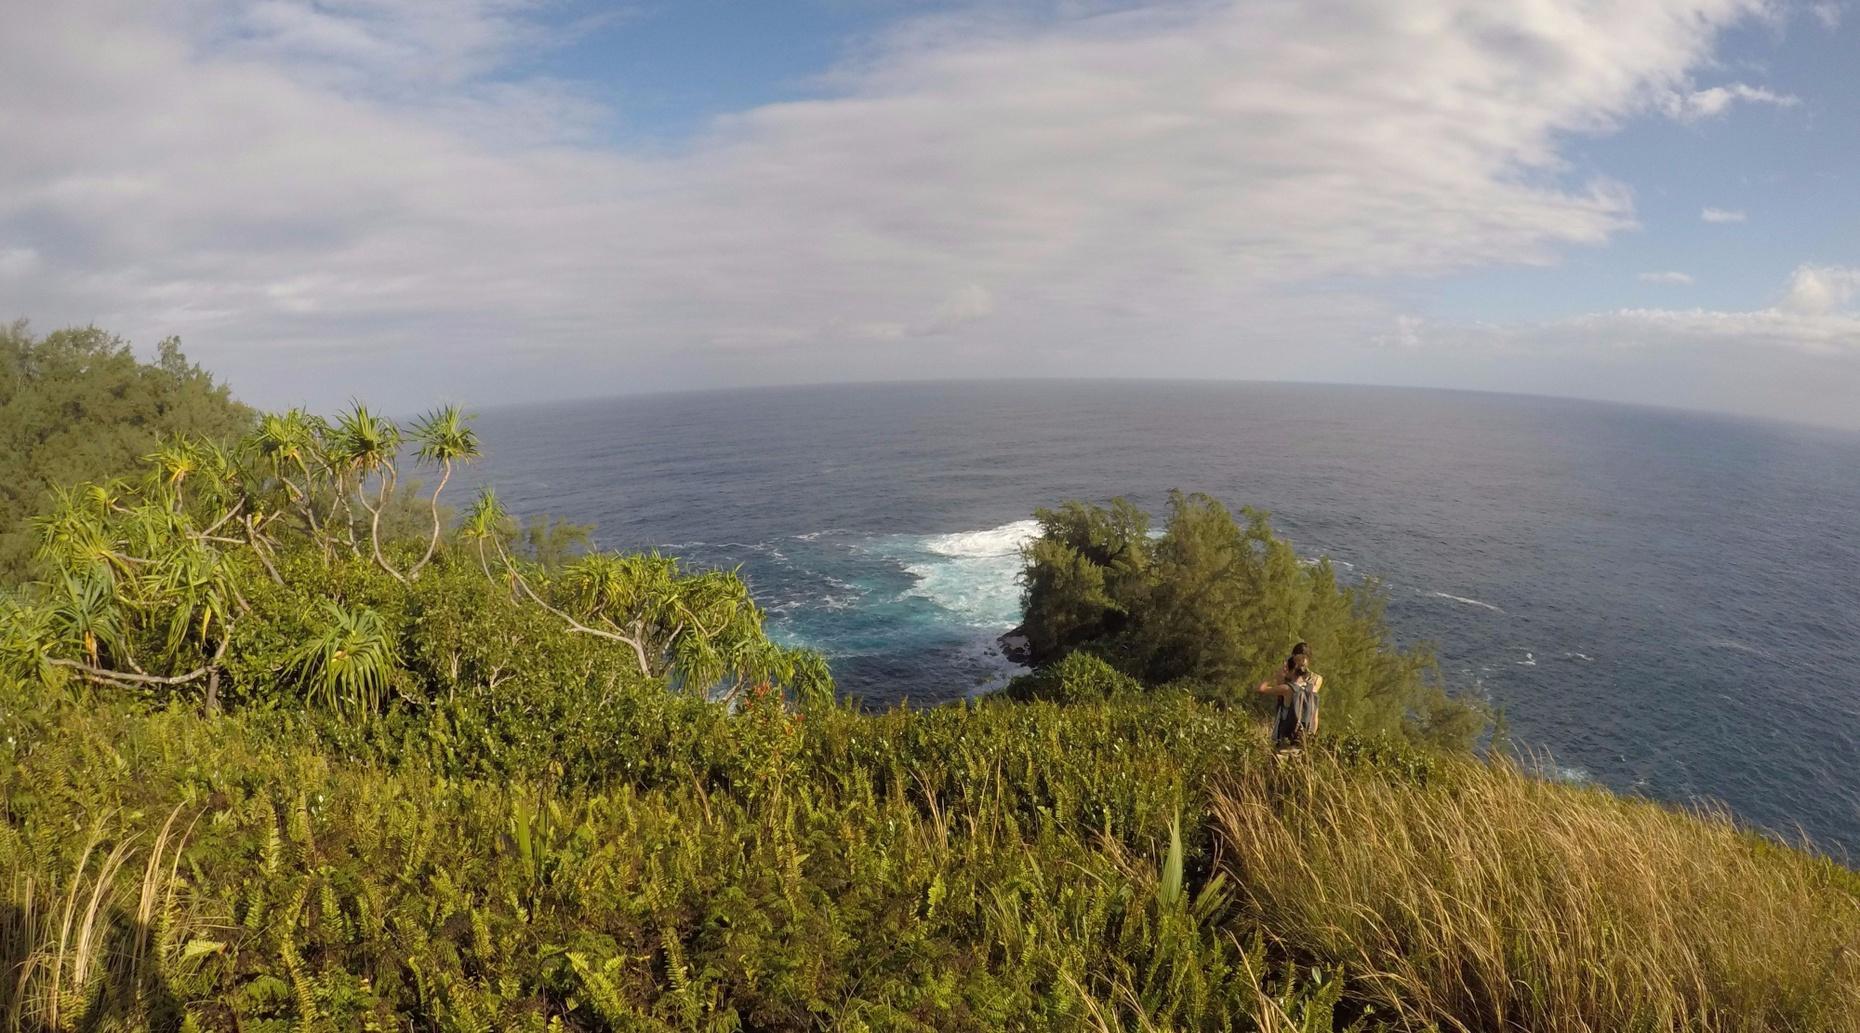 Ridgeline Hiking Experience in Waiela